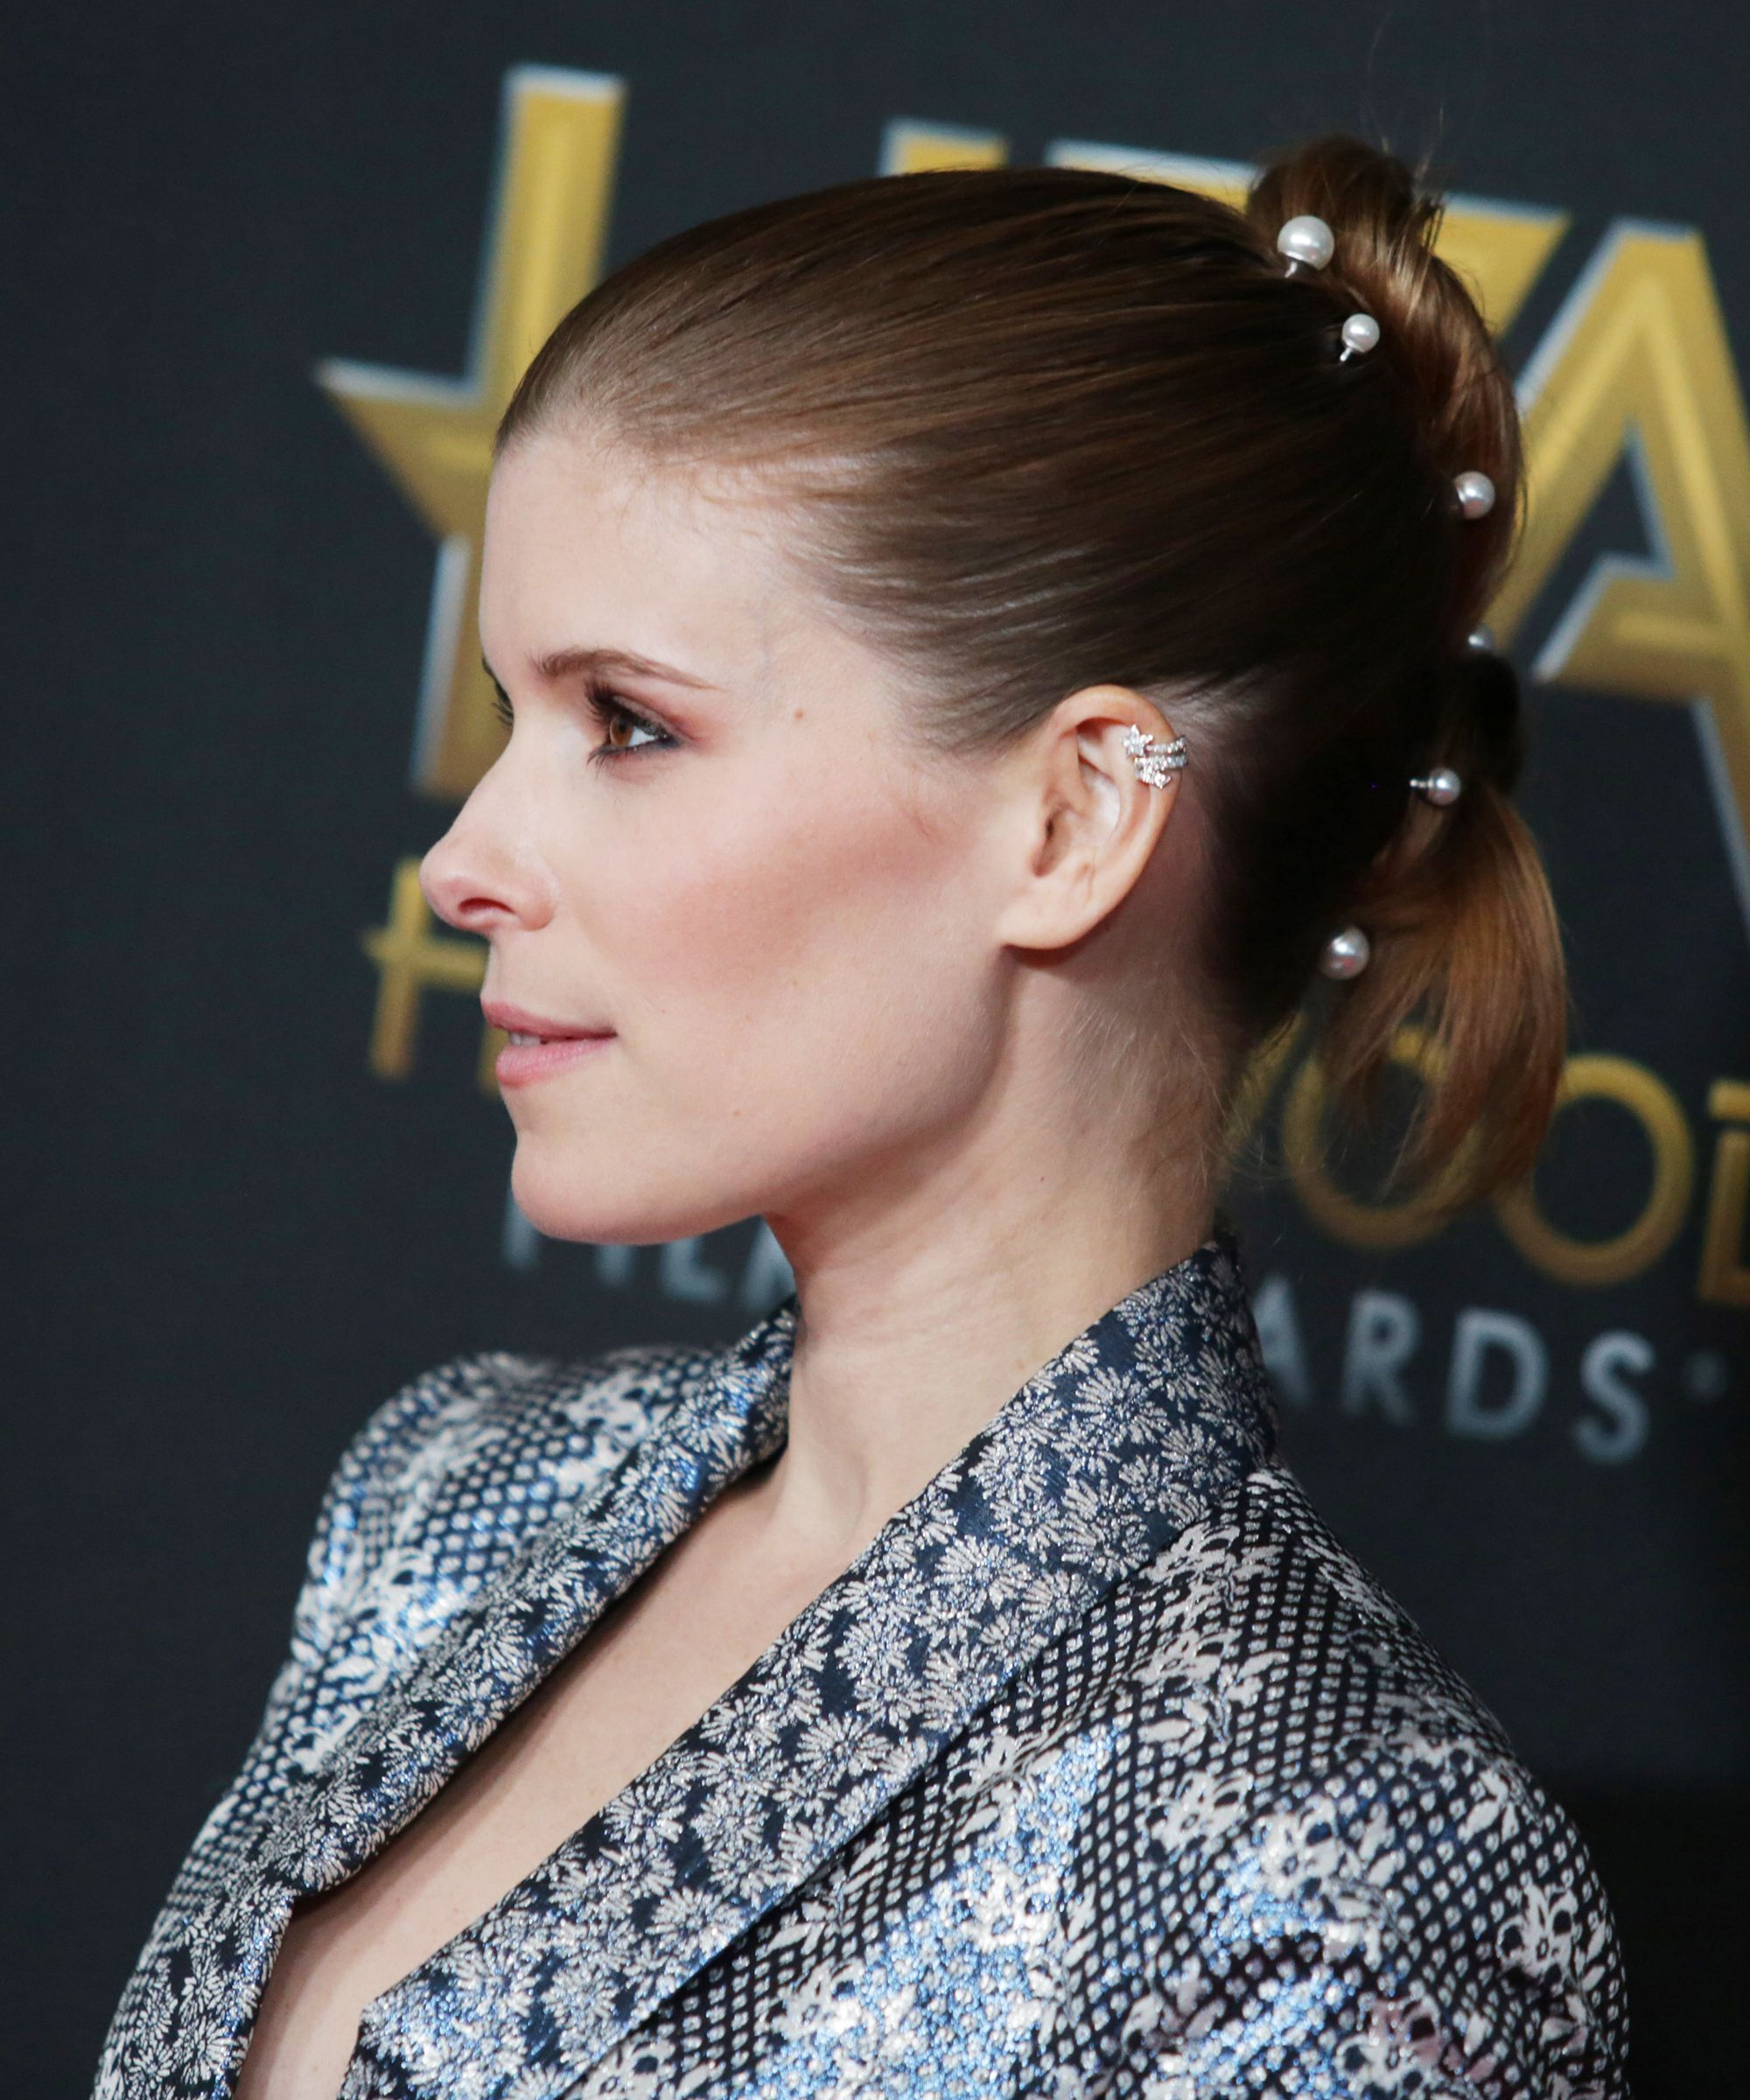 Hollywood Is Loving This Minimalist Hair Trend